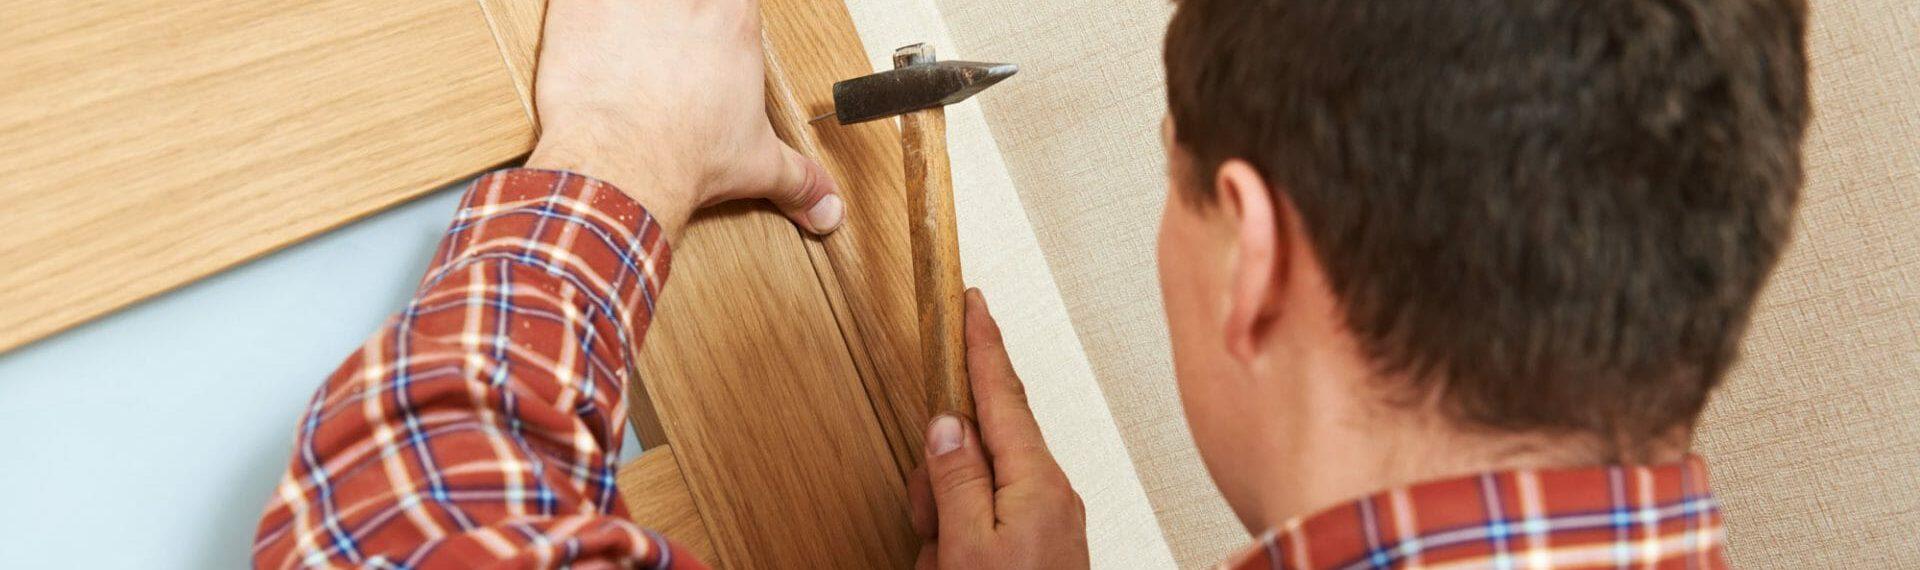 handyman using hammer to repair door